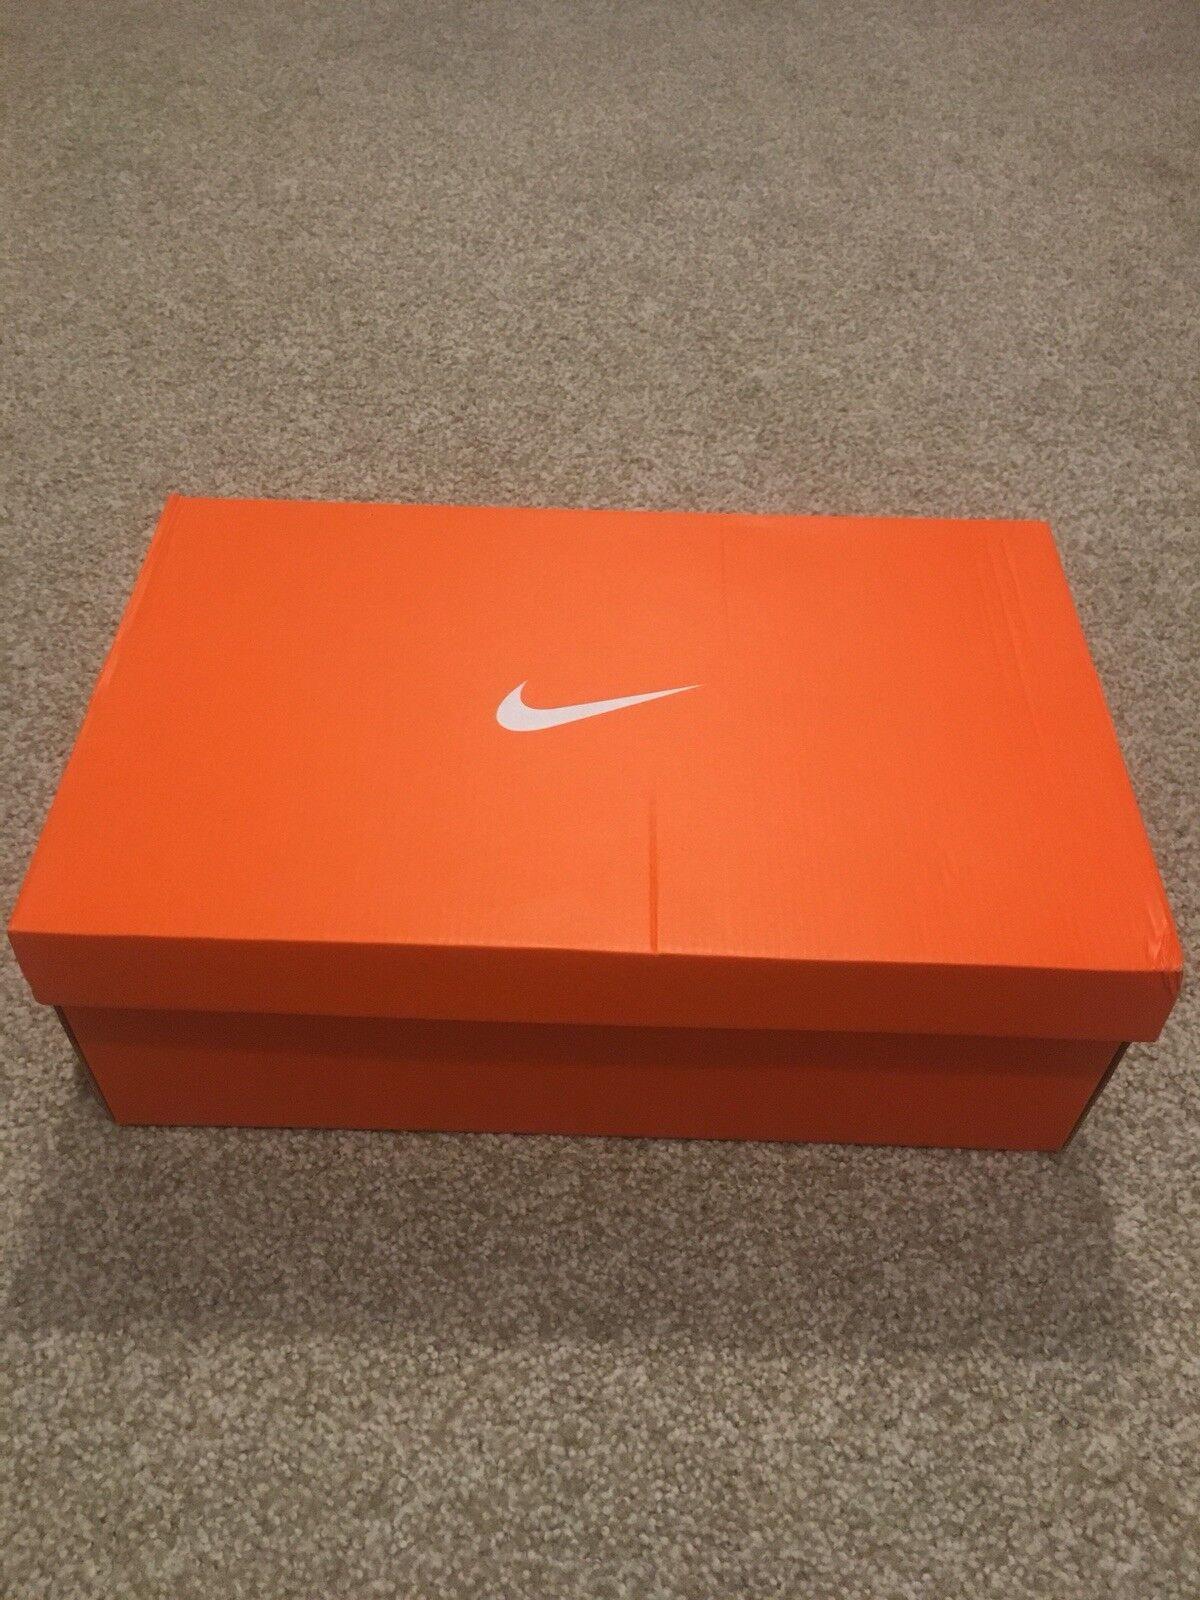 Nike Hypderdunk 2018 team blue size 10